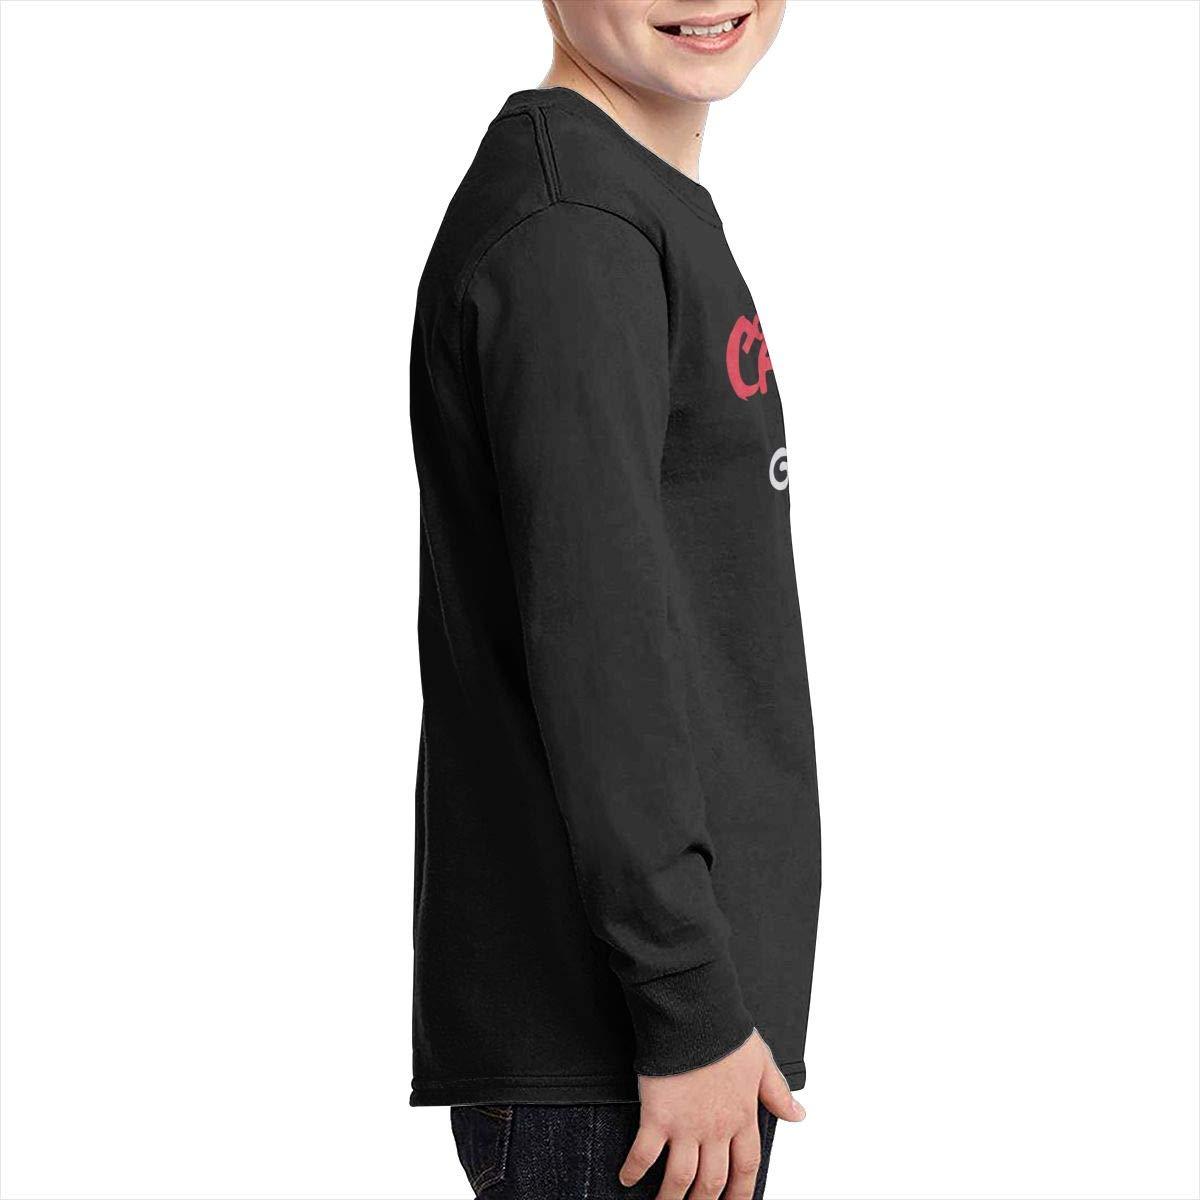 Caifanes Boys Fashion Classic Long Sleeve T-Shirt Boy Long Sleeve Cotton Round Neck T-Shirt